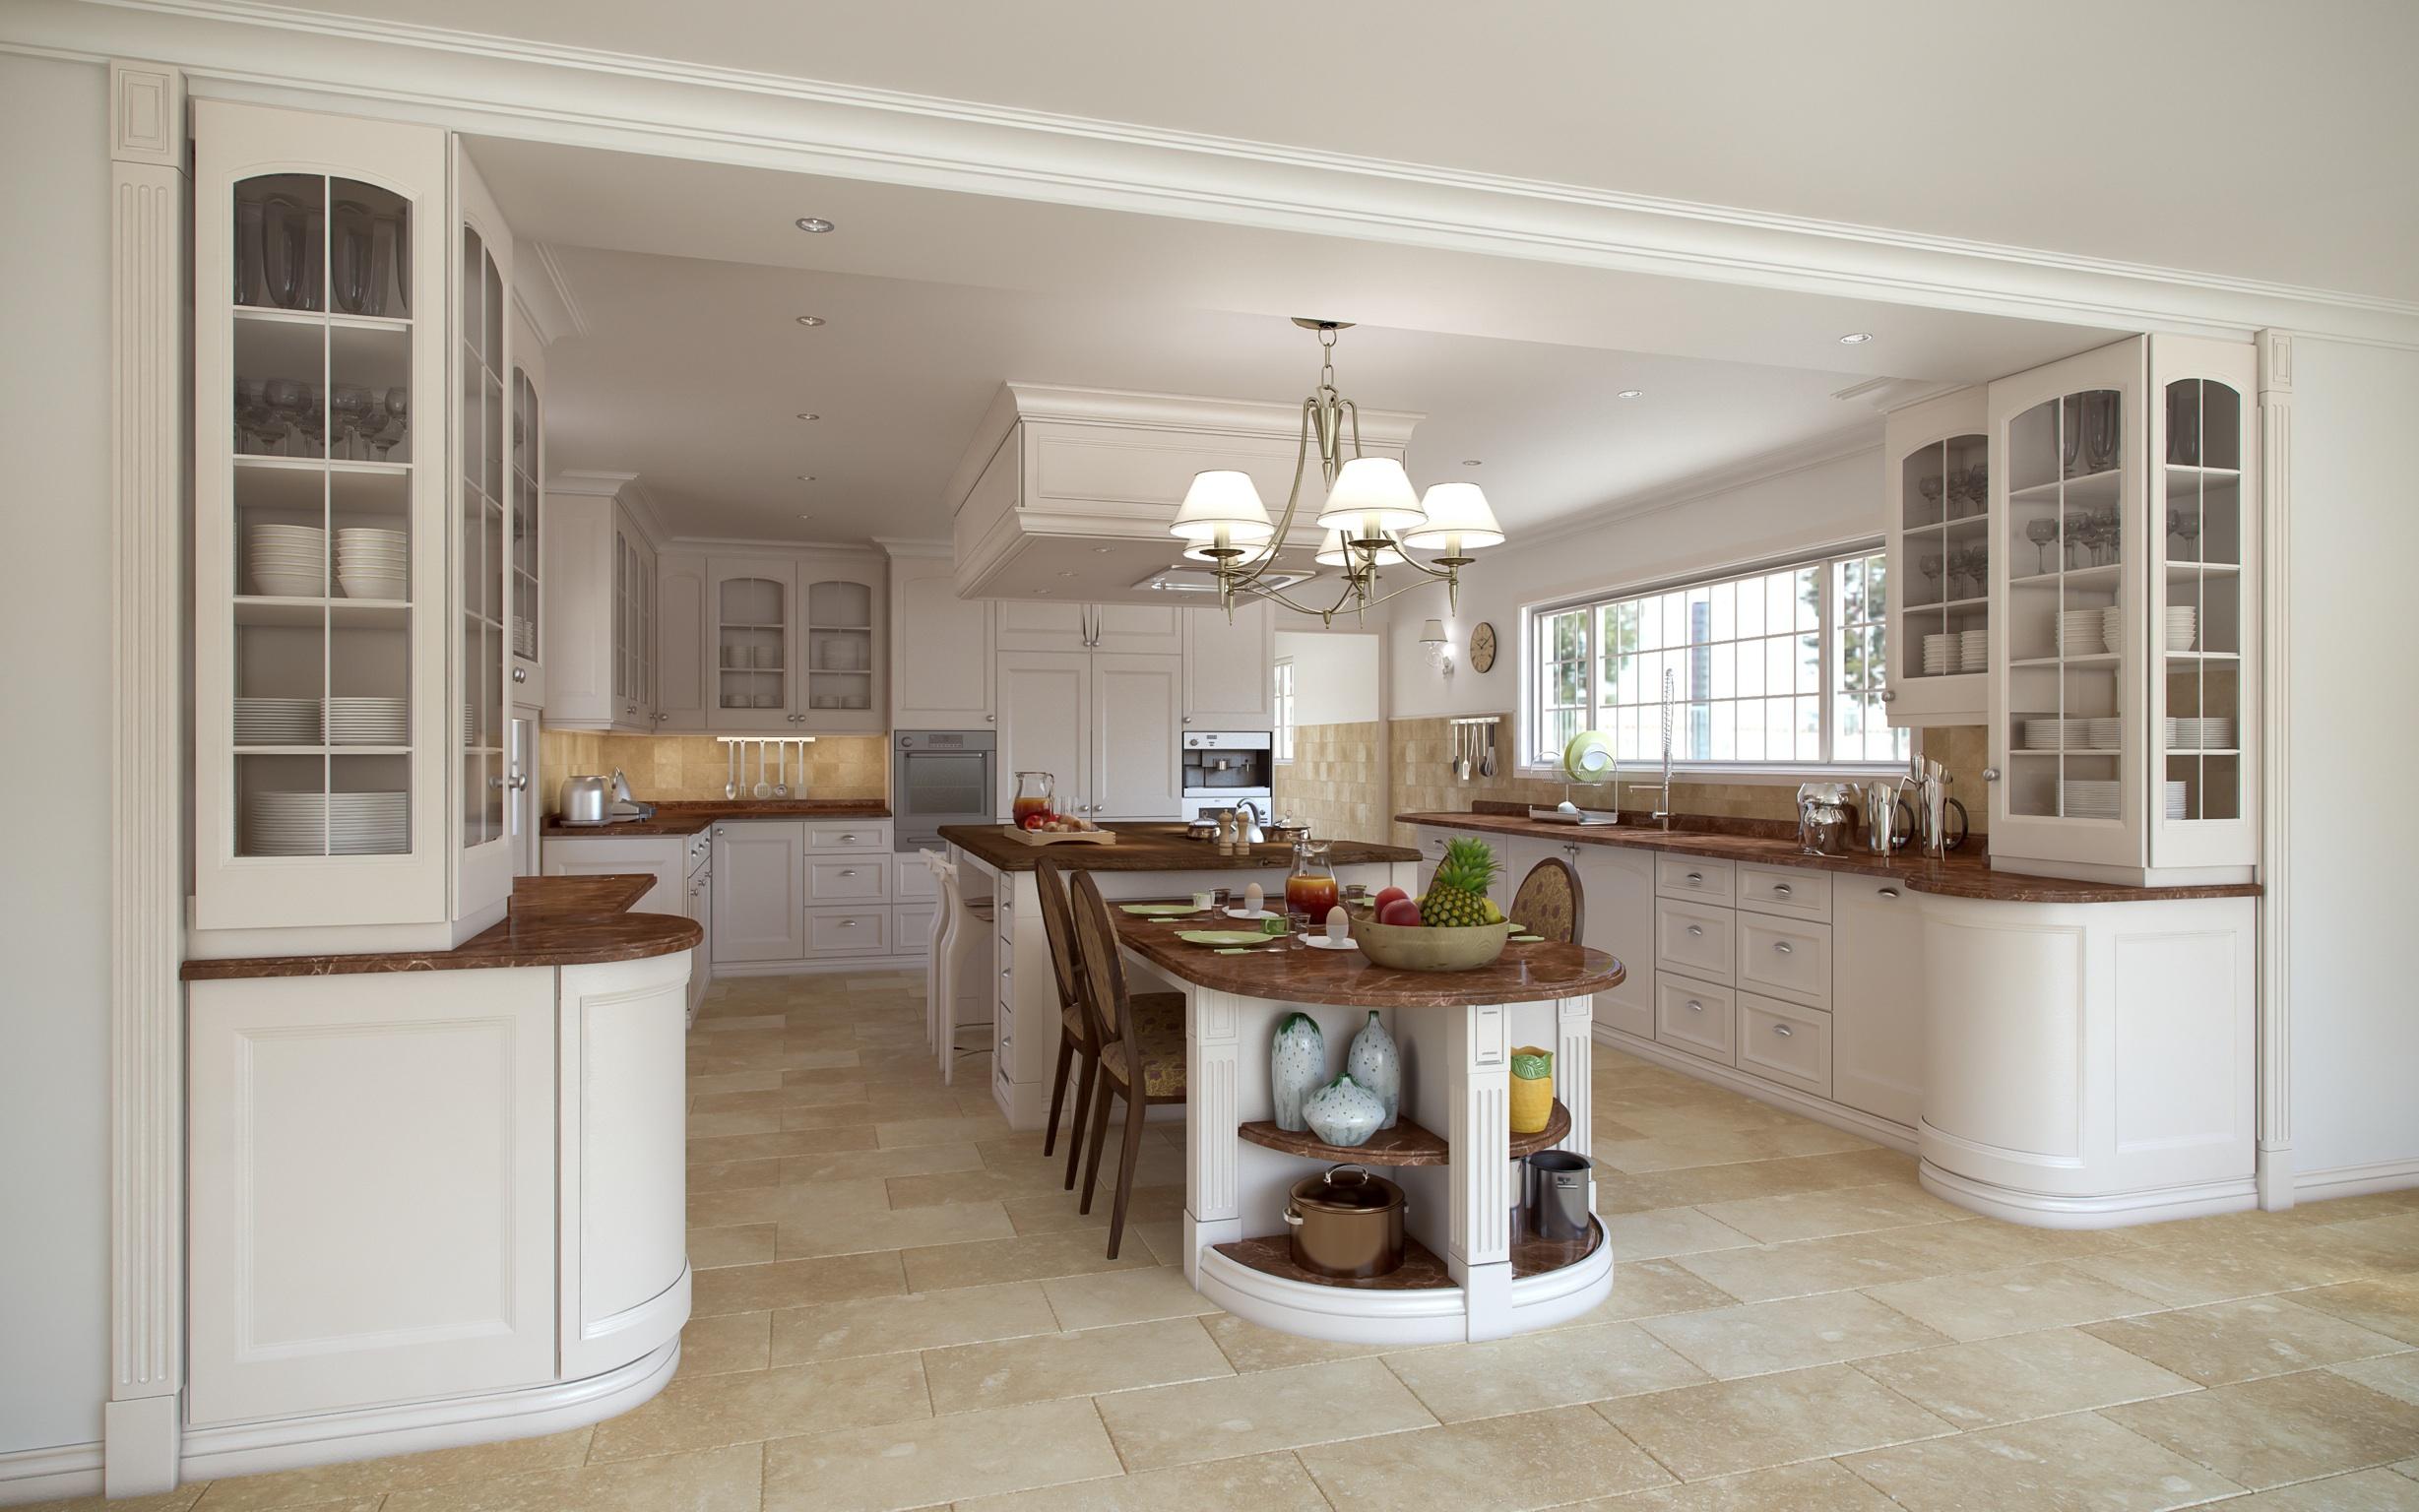 White Kitchen Camera 1 By Cocolicous On DeviantArt